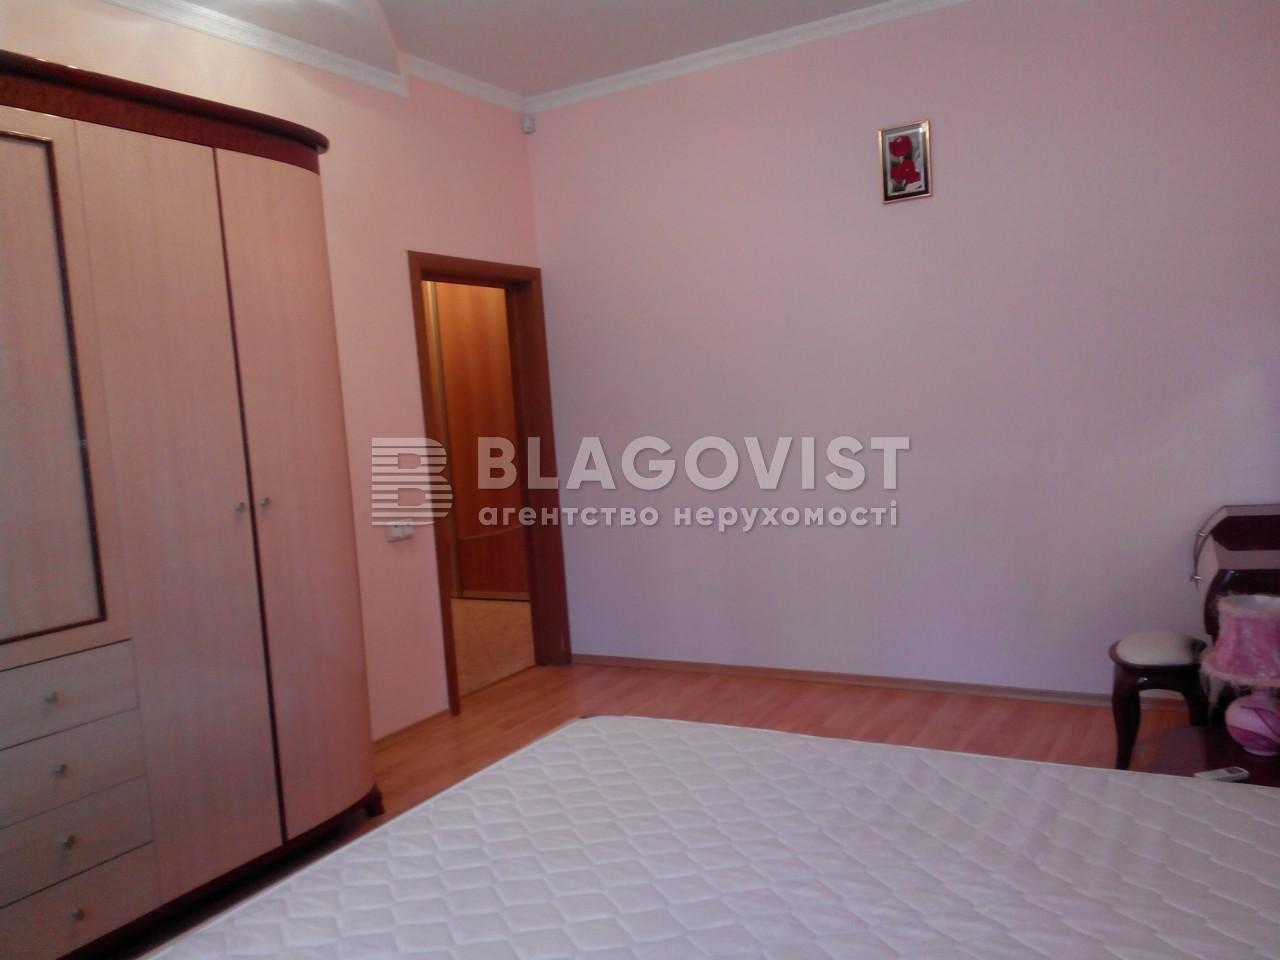 Квартира F-7298, Героев Сталинграда просп., 10а, Киев - Фото 9